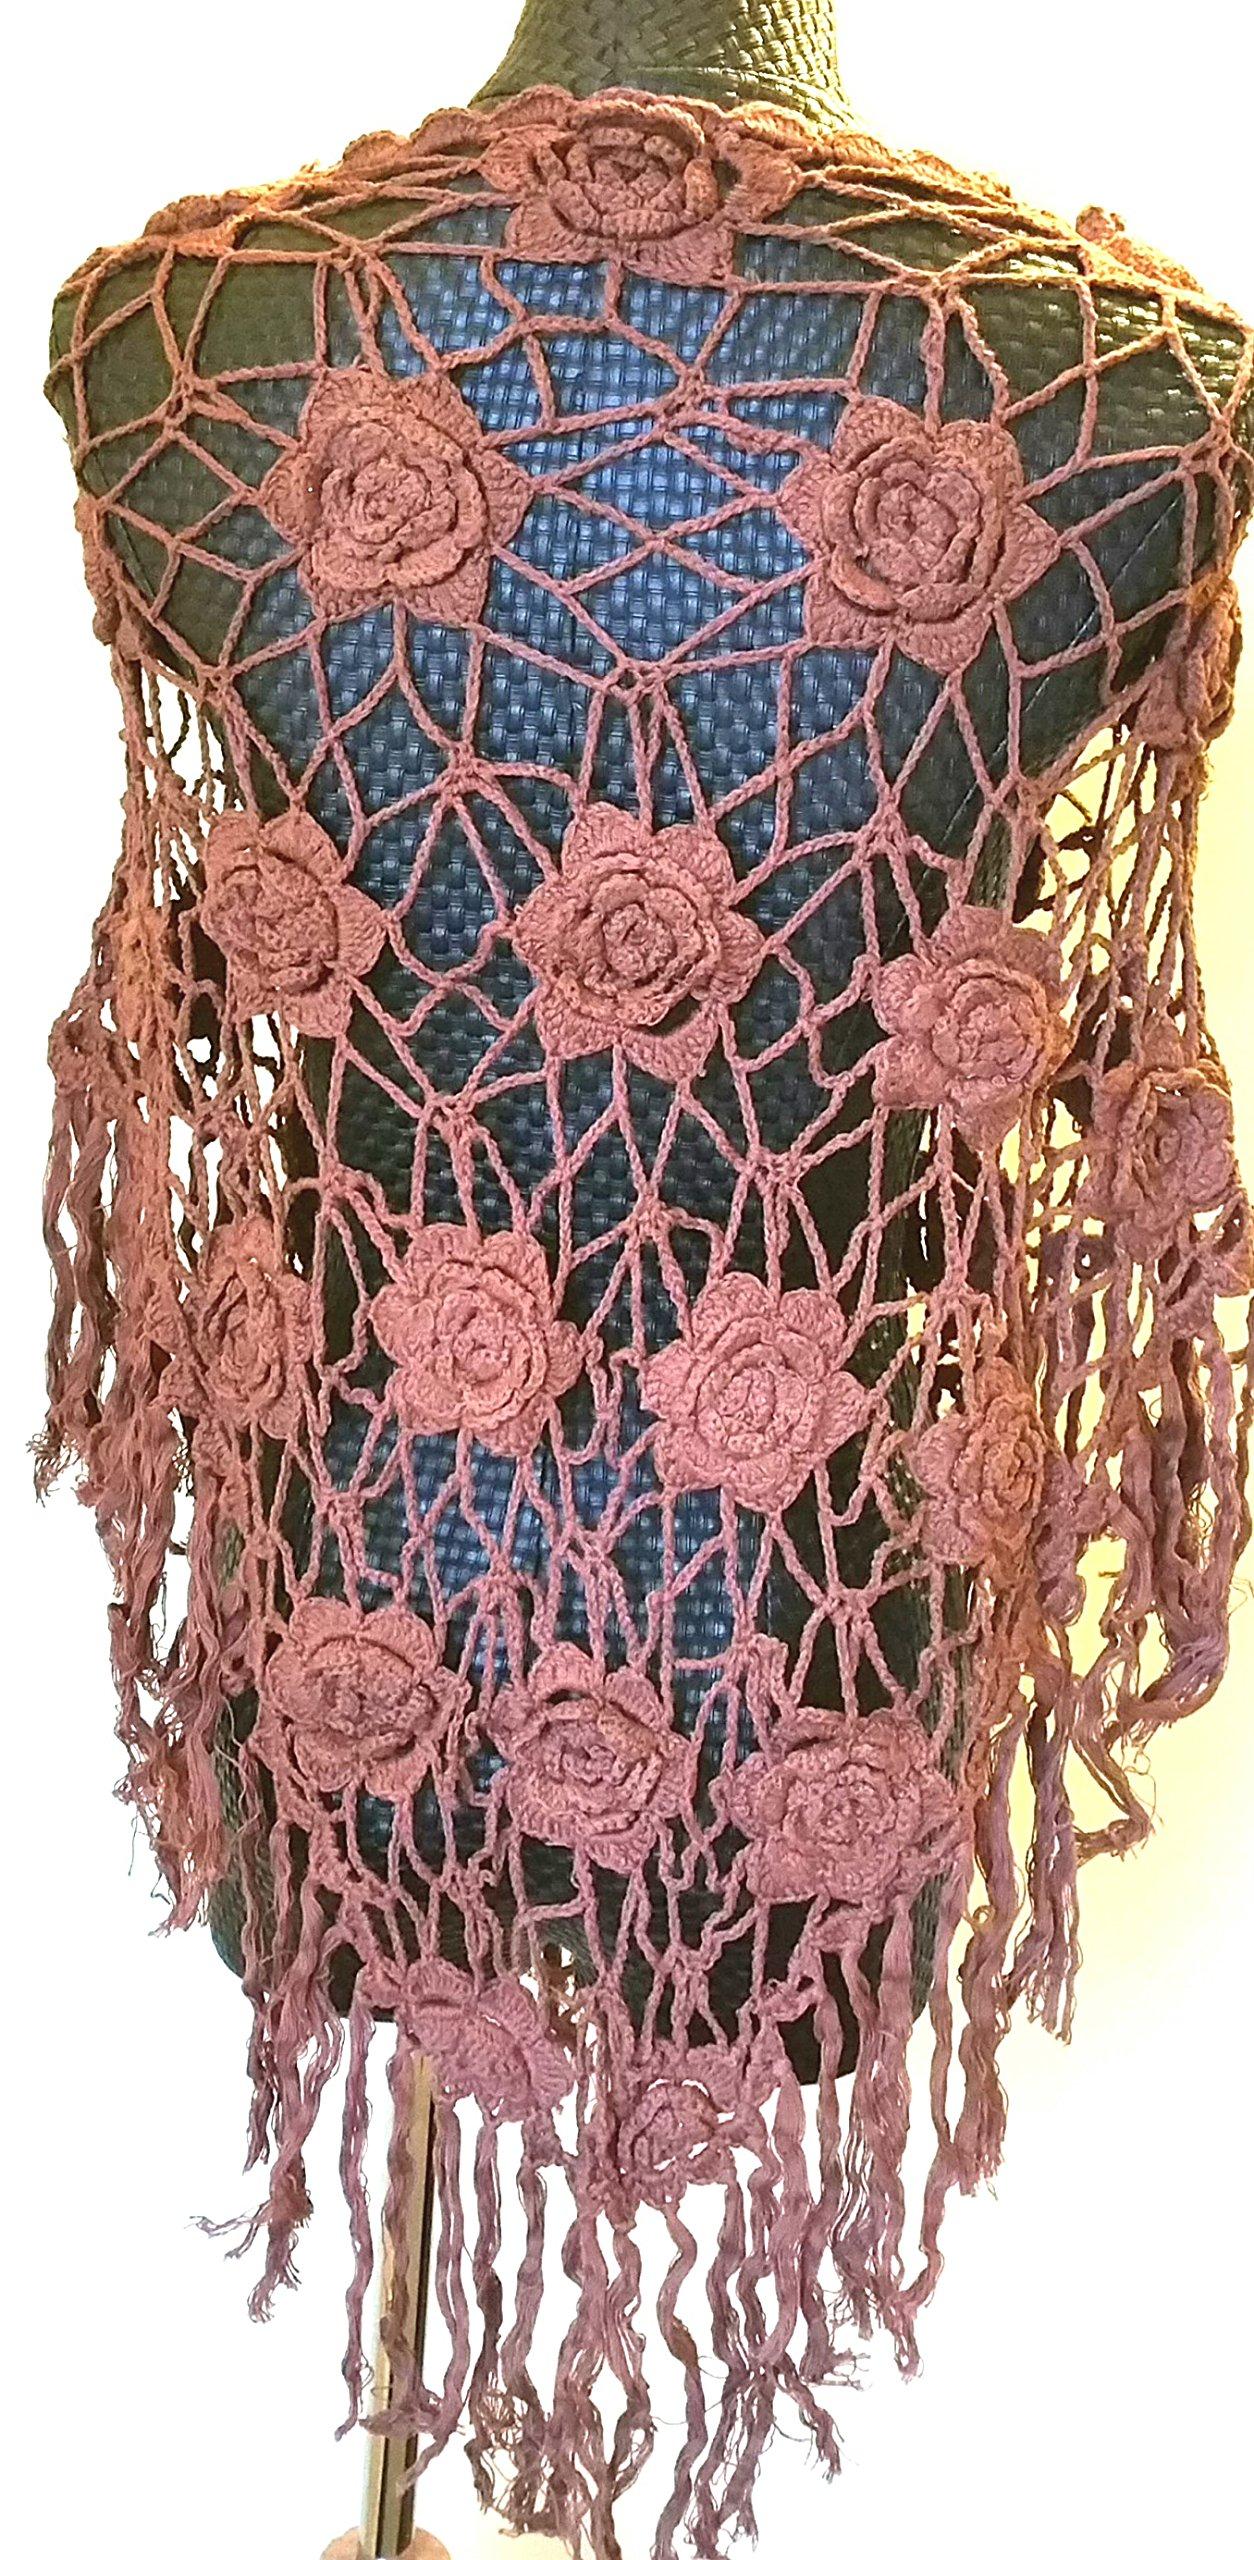 Vintage Loose Knit Crochet Fringe Poncho Swim Cover Pool Drape Top brown by Crochet Poncho (Image #2)